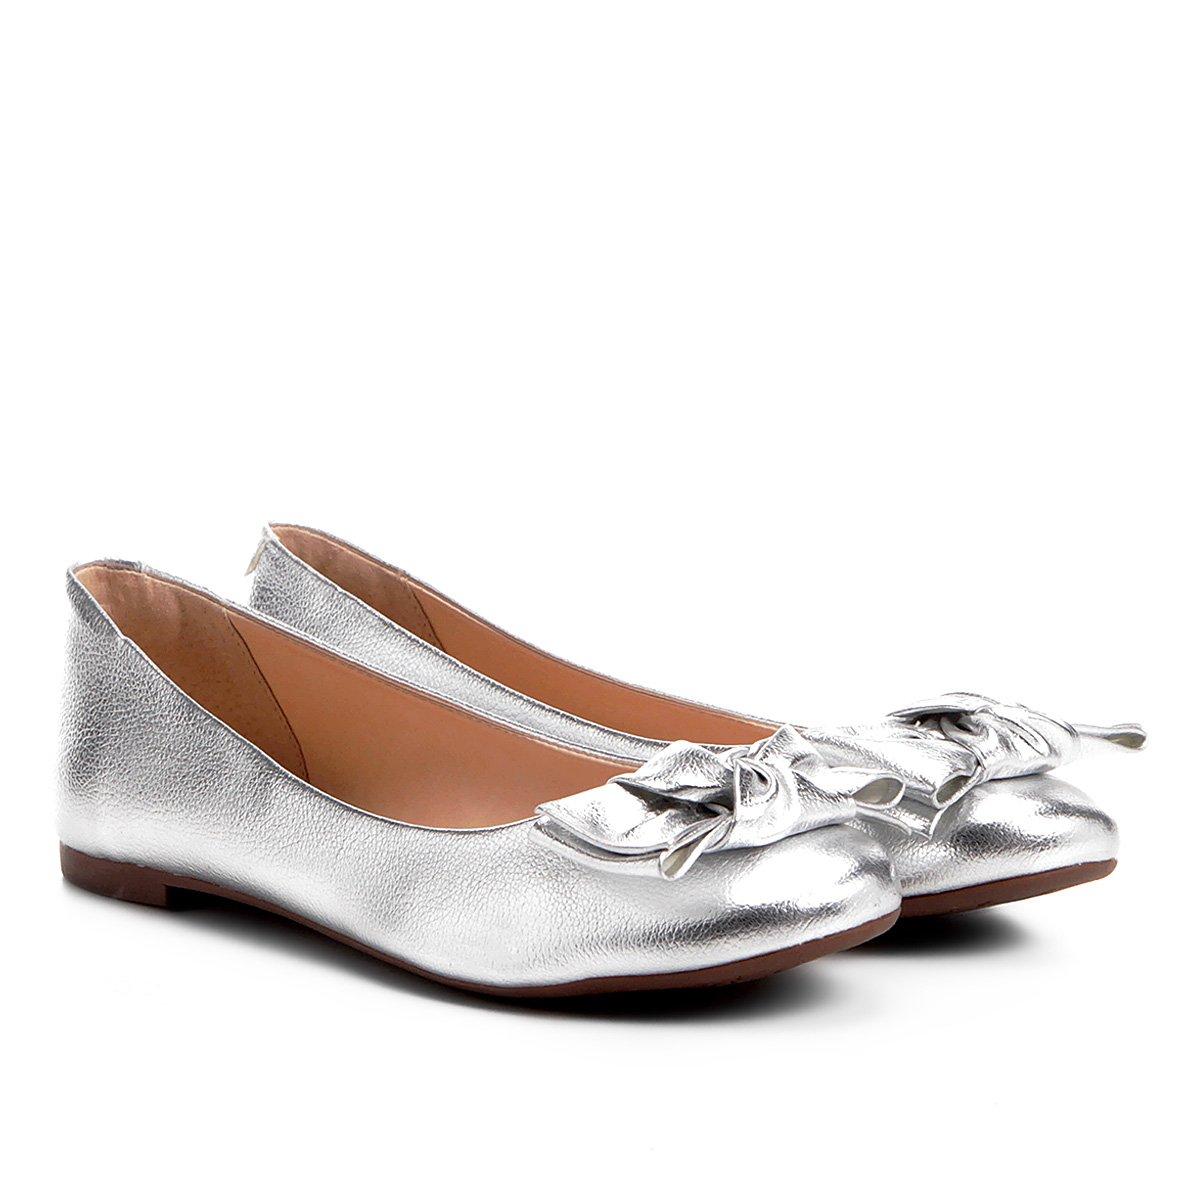 97f54aa8a Sapatilha Shoestock Bico Redondo Laço Feminina | Shoestock